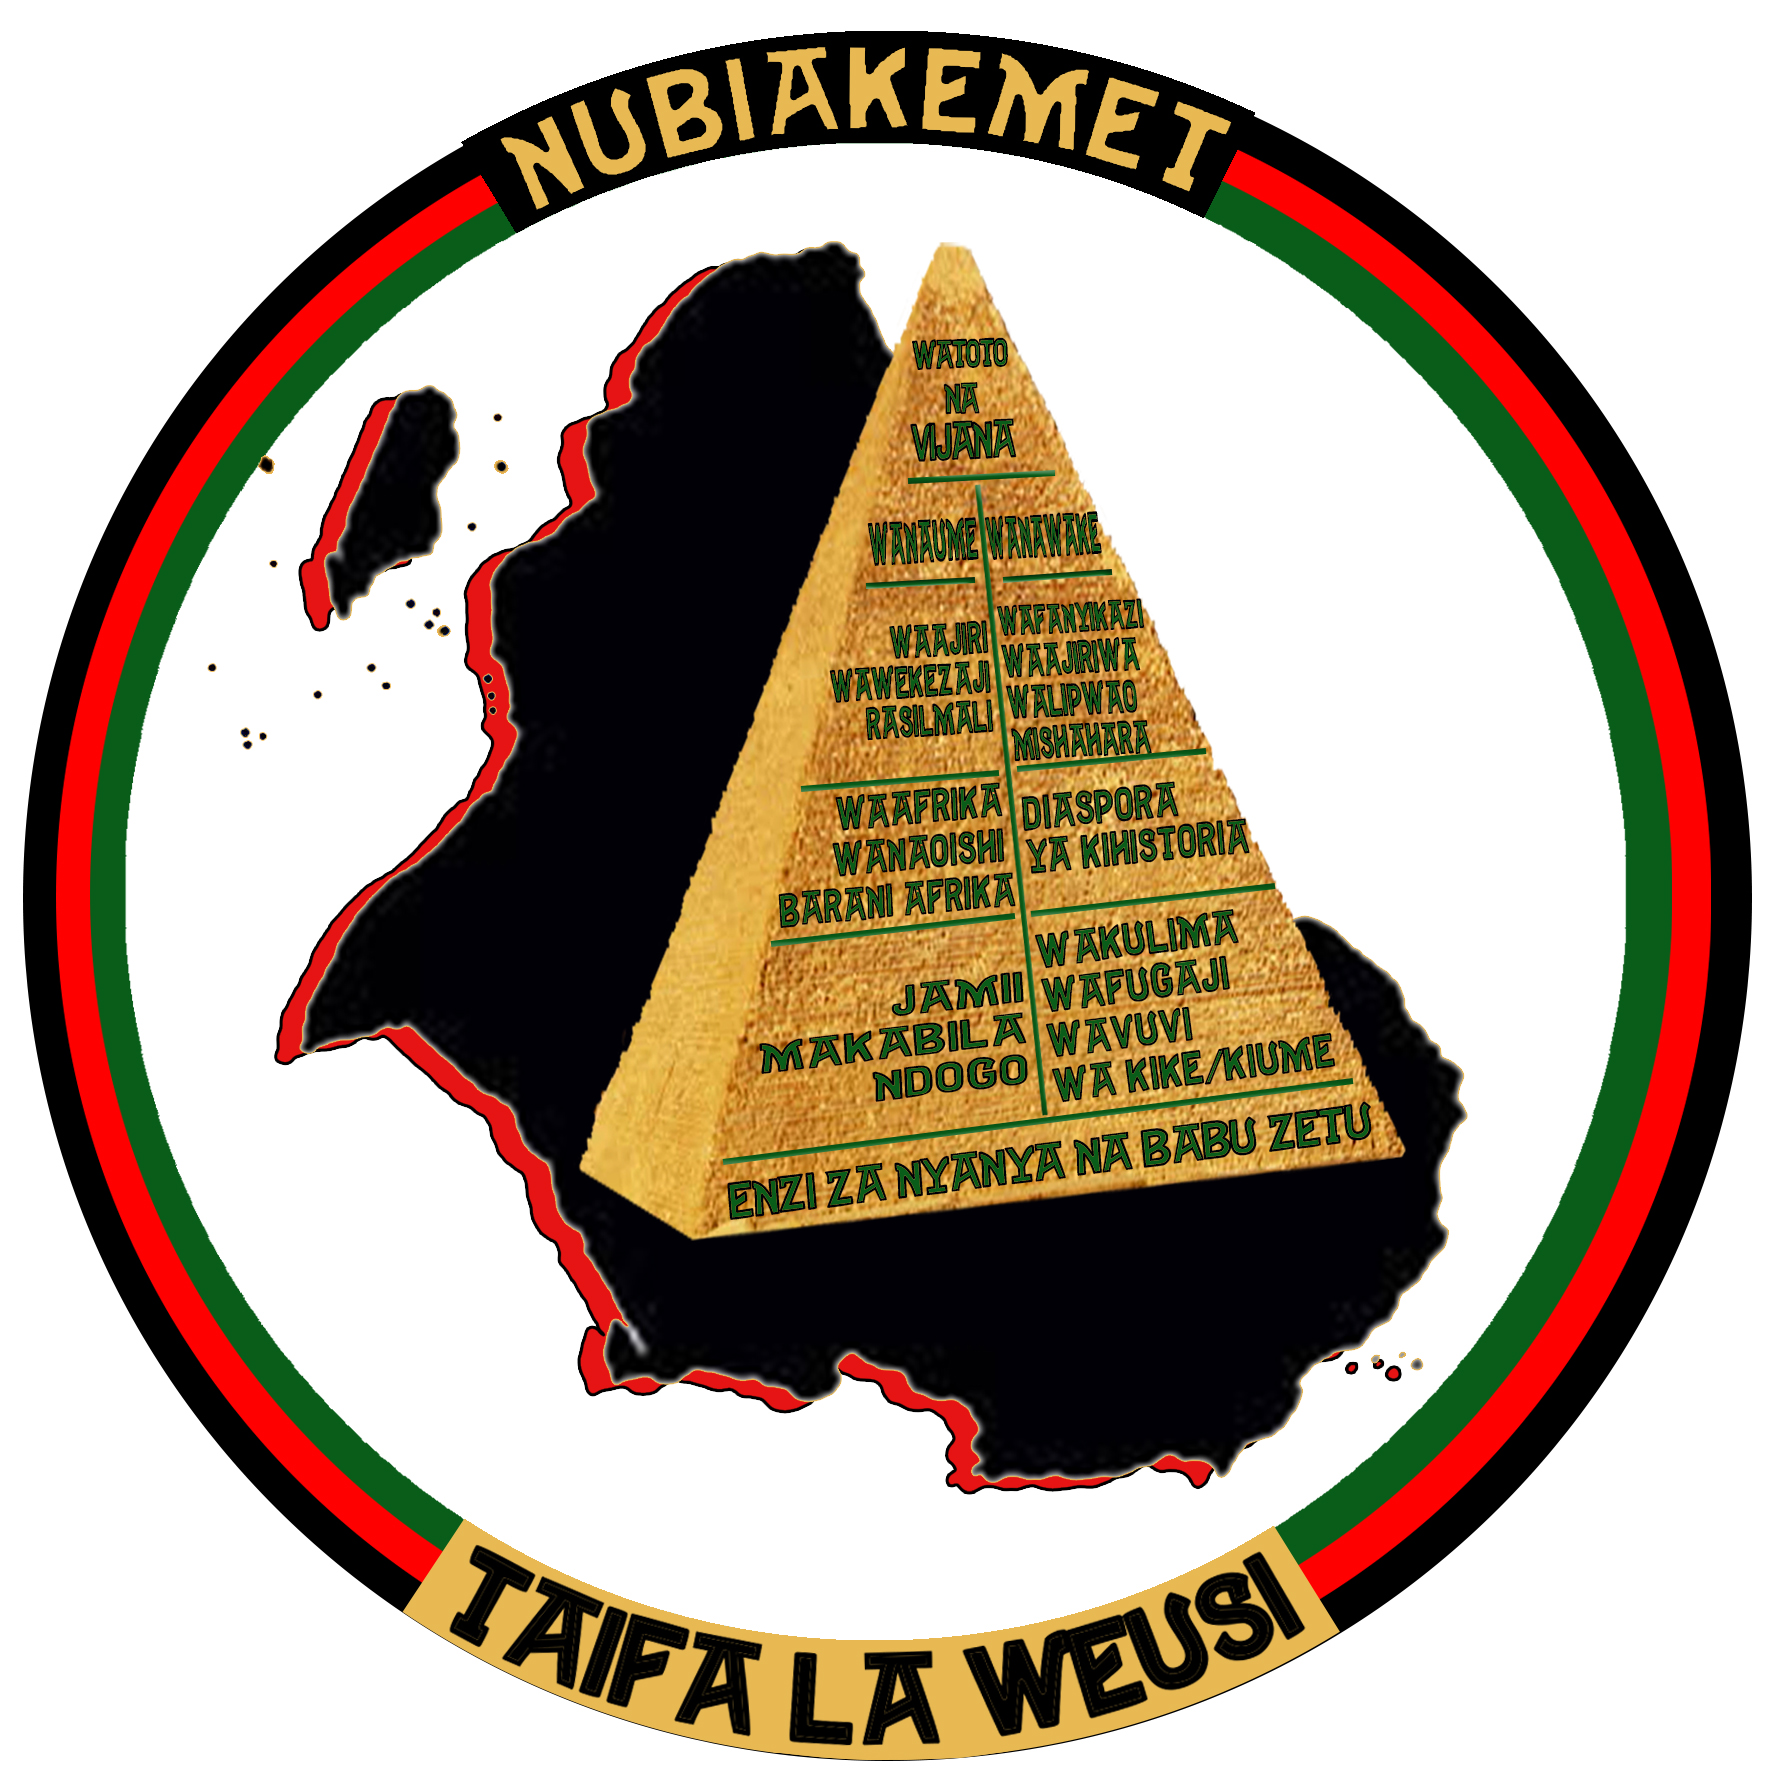 Nubia Kemet